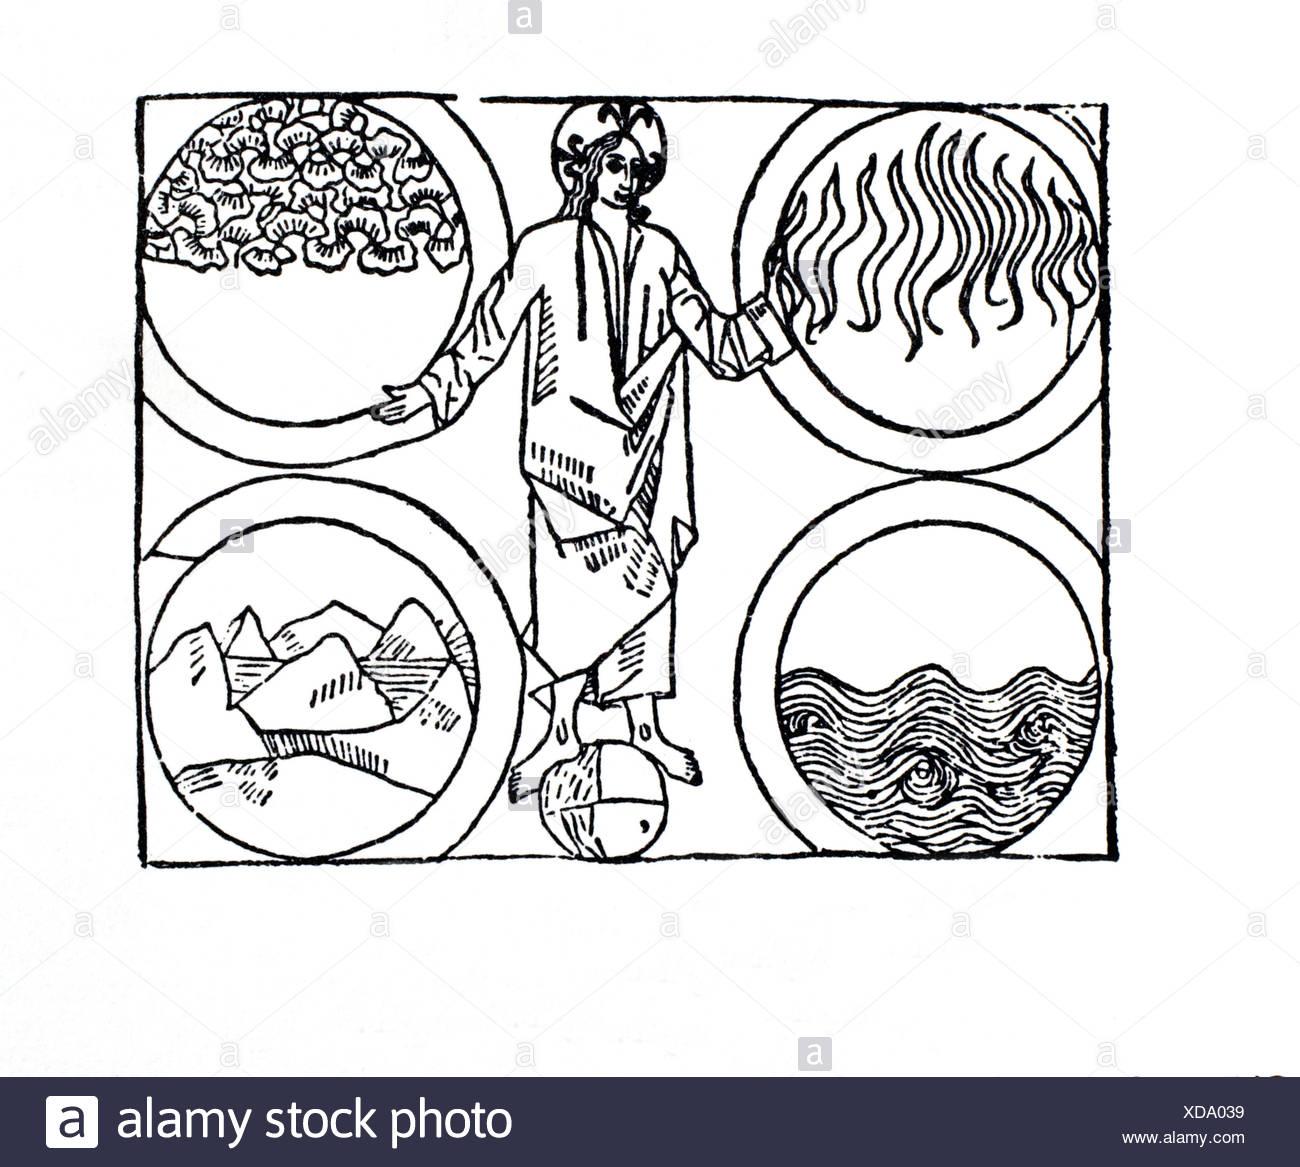 The Creator, master of Elements. De proprietatibus rerum (On the Properties of Things) by Bartholomaeus Anglicus. Lyon, 1491. - Stock Image